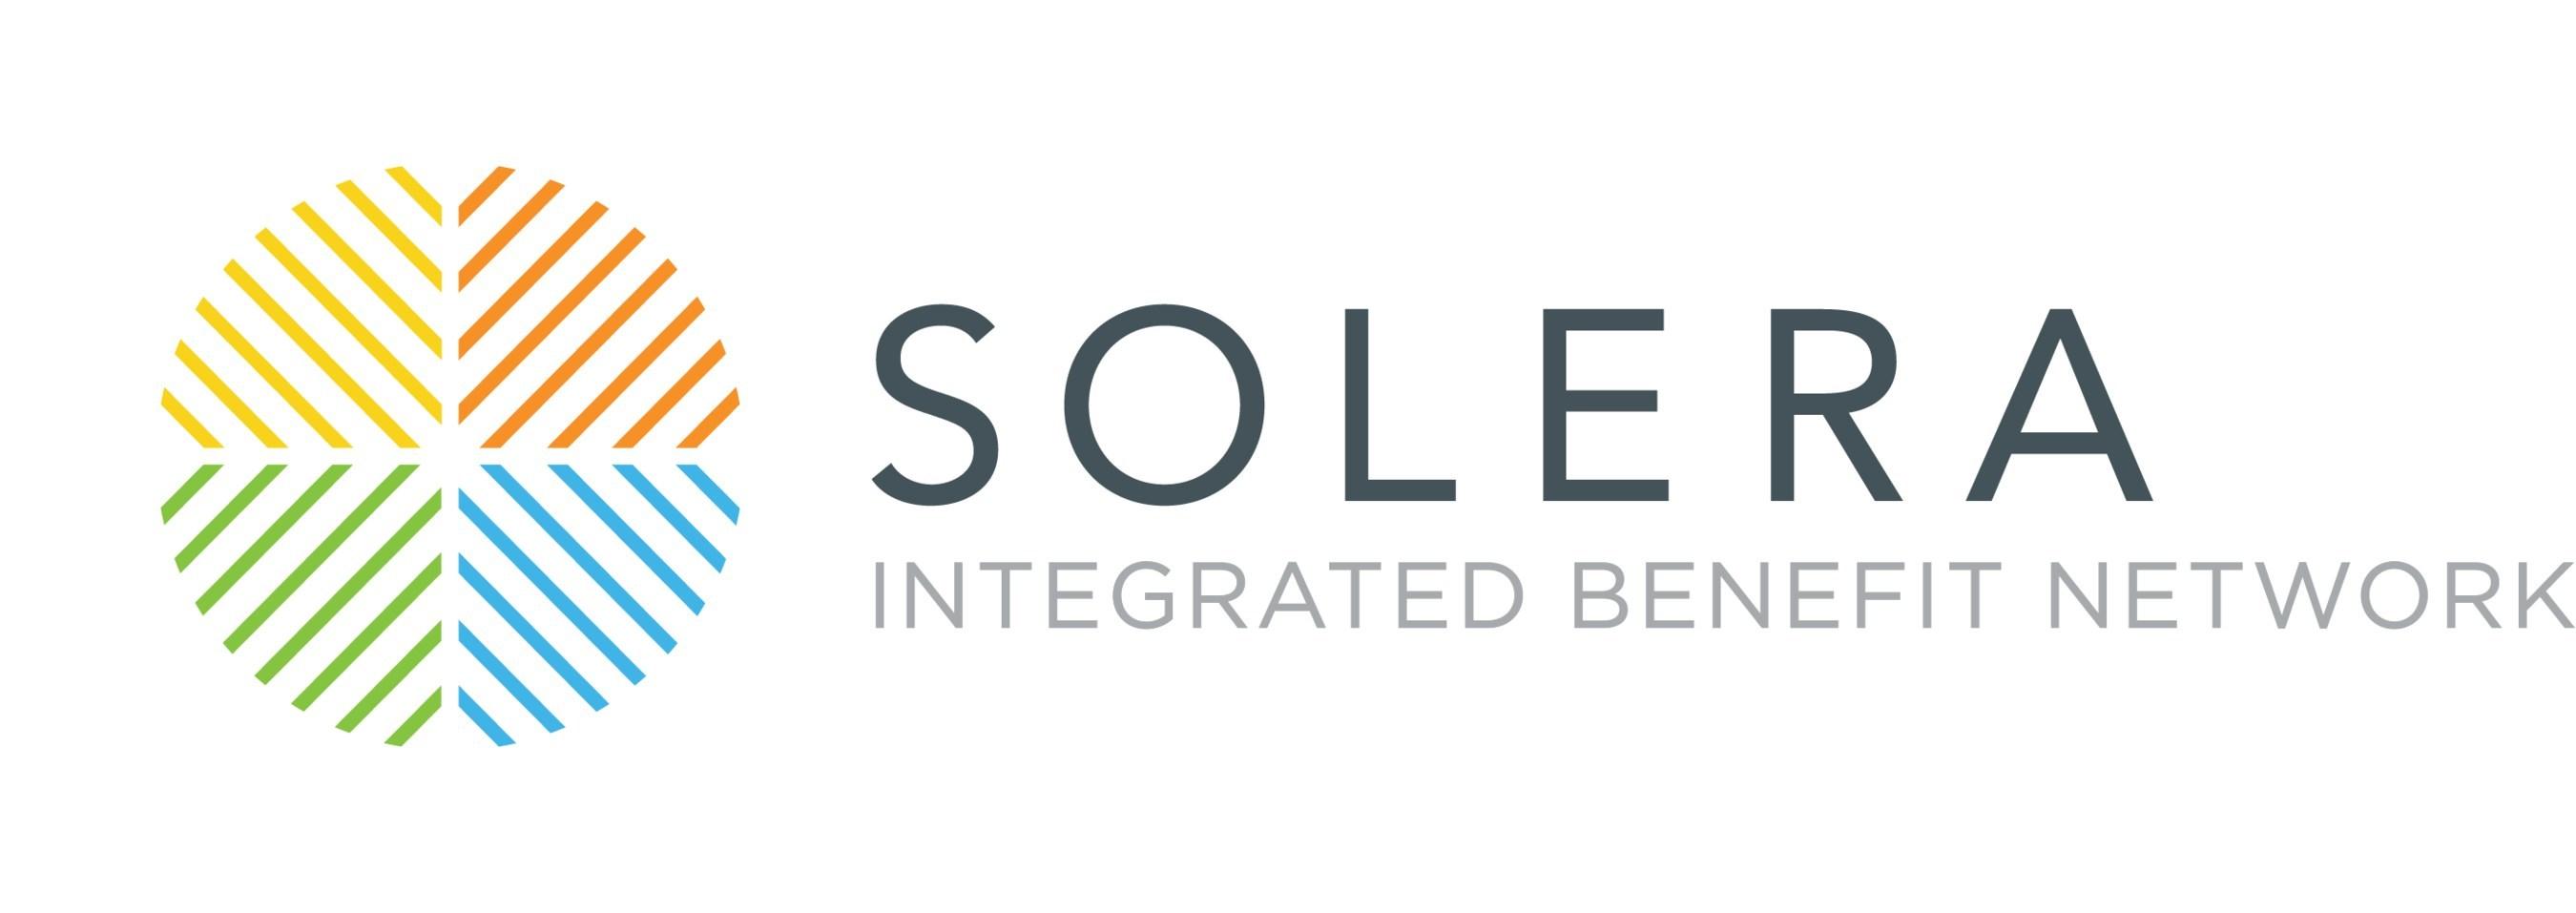 Solera Health, a leading integrated benefit network. (PRNewsfoto/Solera Health)